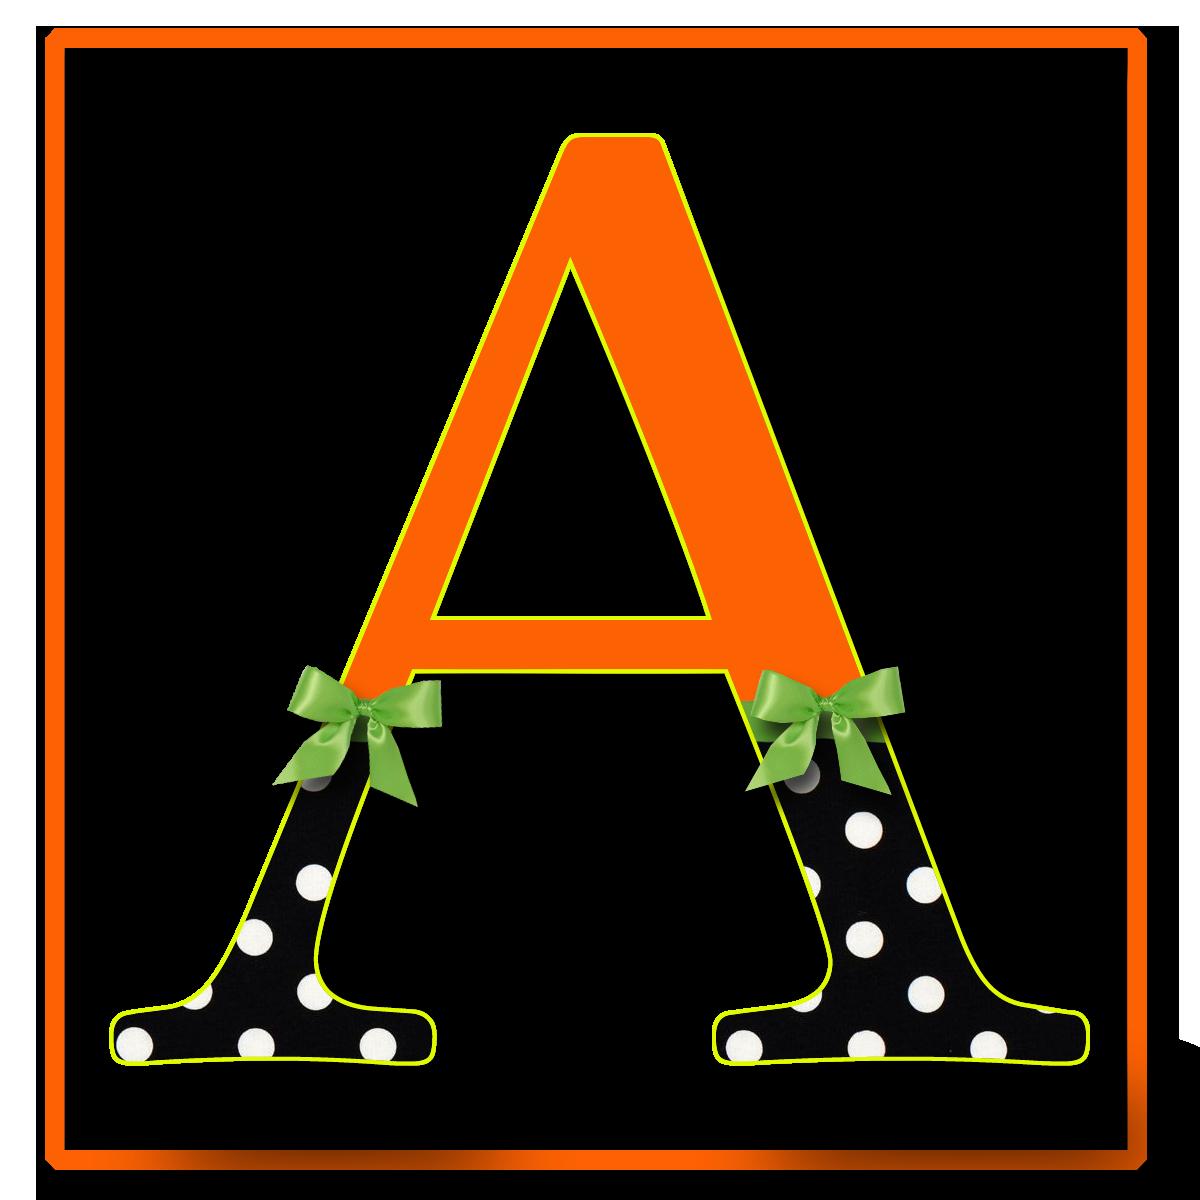 vector free download Letter clipart halloween. Sgblogosfera mar a jos.